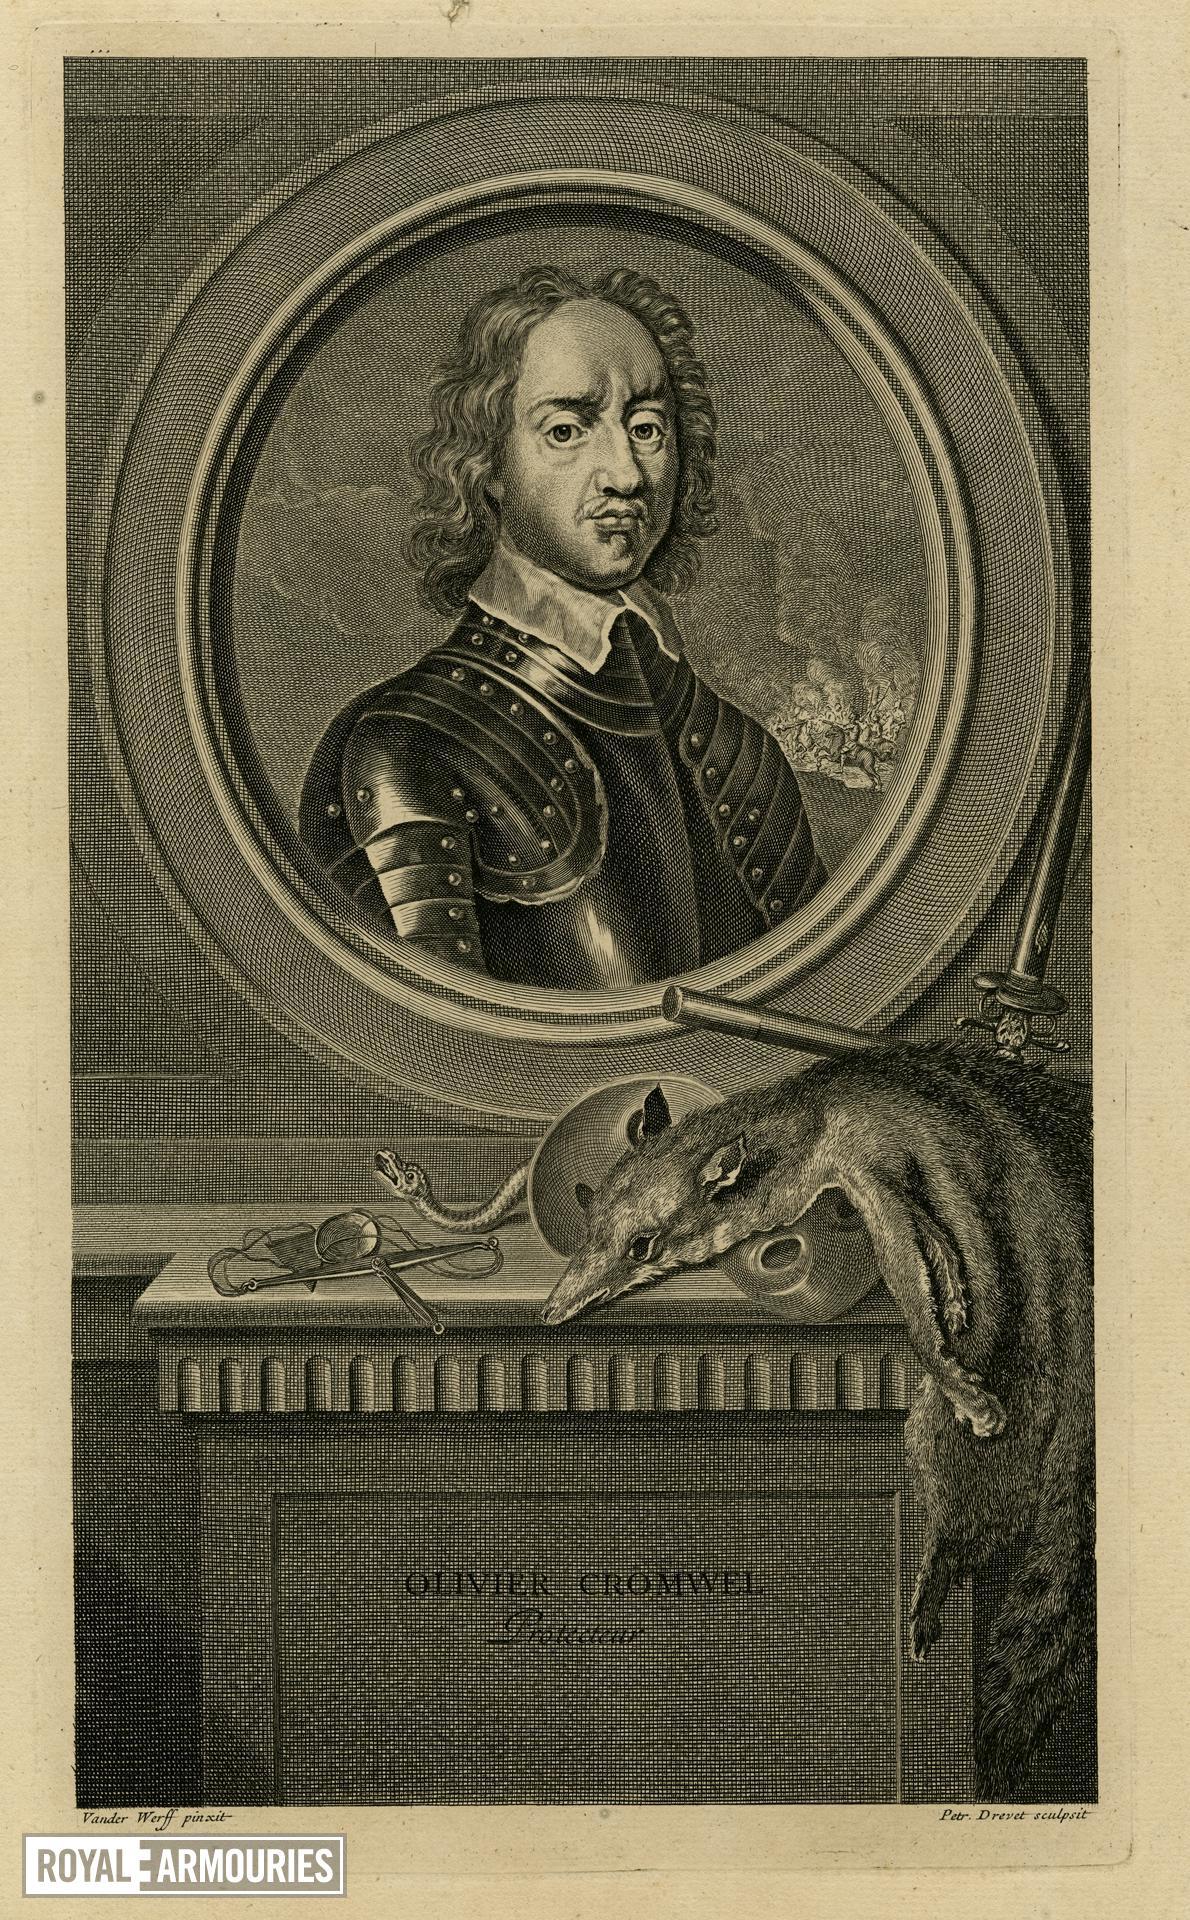 Engraving of Oliver Cromwell 'Protecteur' by Vander Werff and Petr Drevet